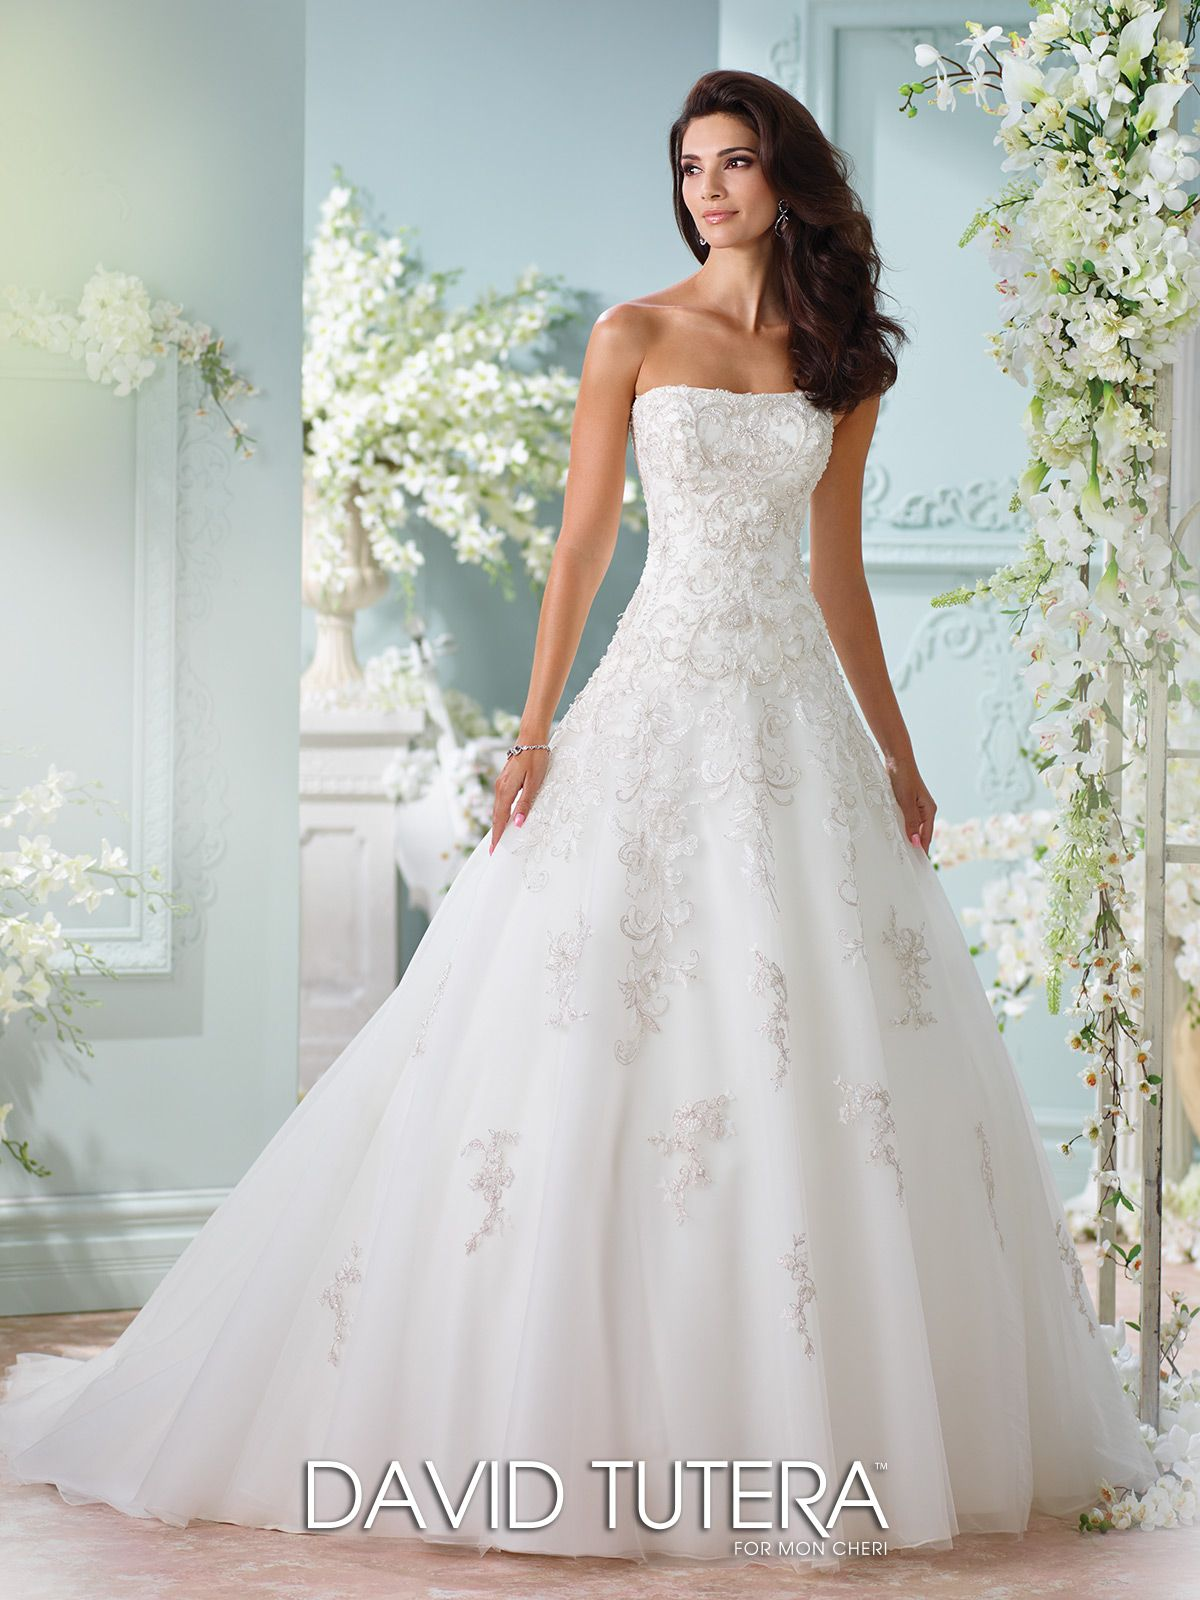 Metallic wedding dress  Strapless HandBeaded Lace u Tulle Wedding Dress  Sunniva